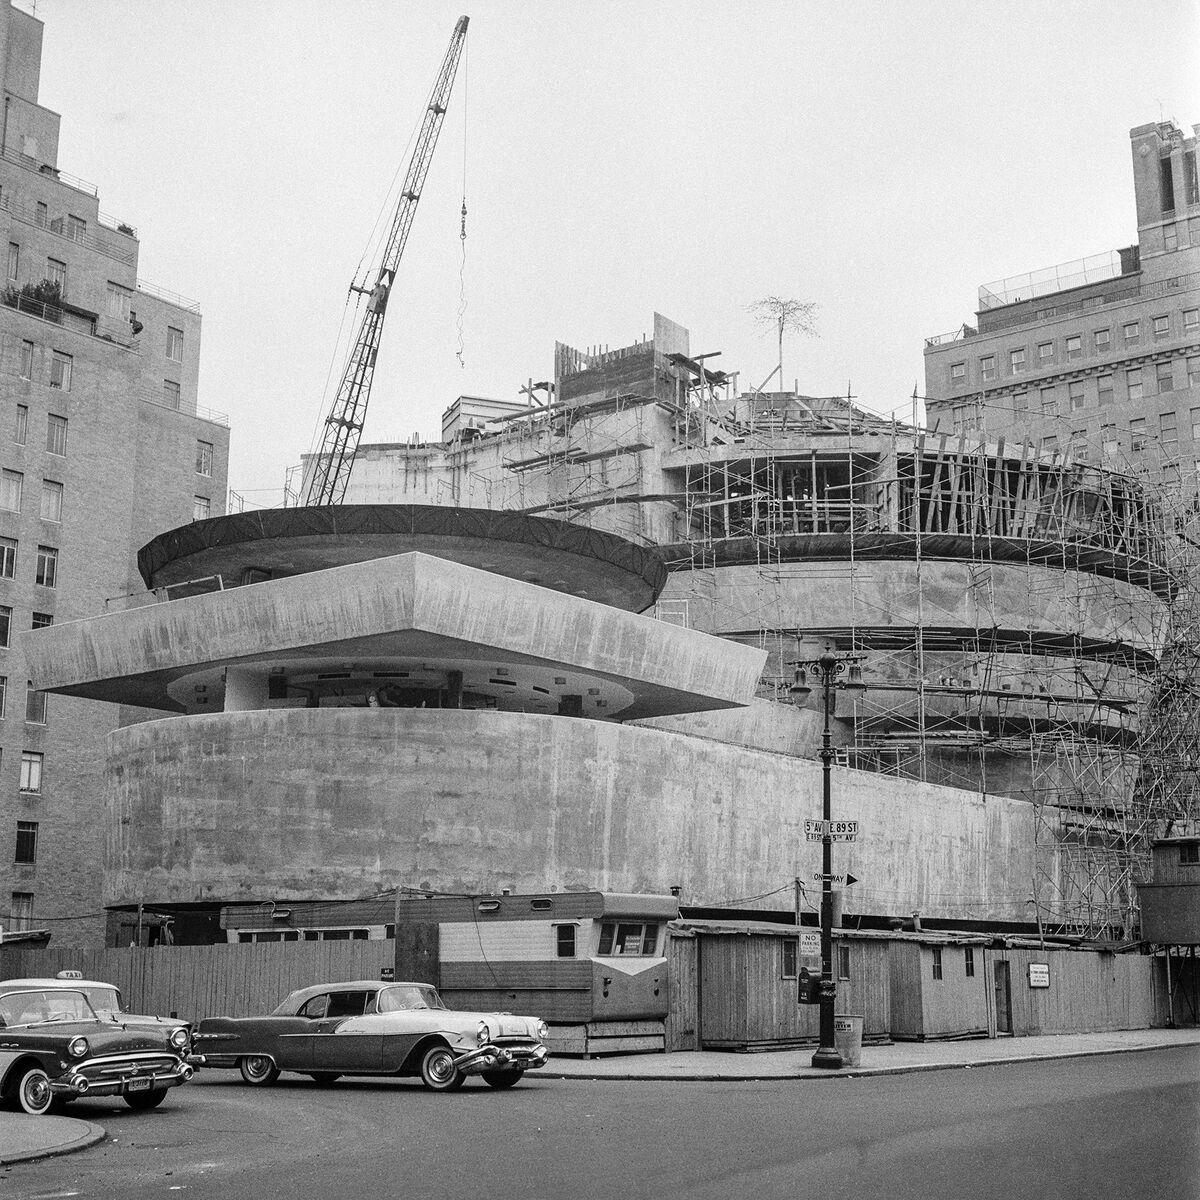 Solomon R. Guggenheim Museum, New York, under construction, ca. 1956–59. Photo by William H. Short. © Solomon R. Guggenheim Museum Archives, New York.